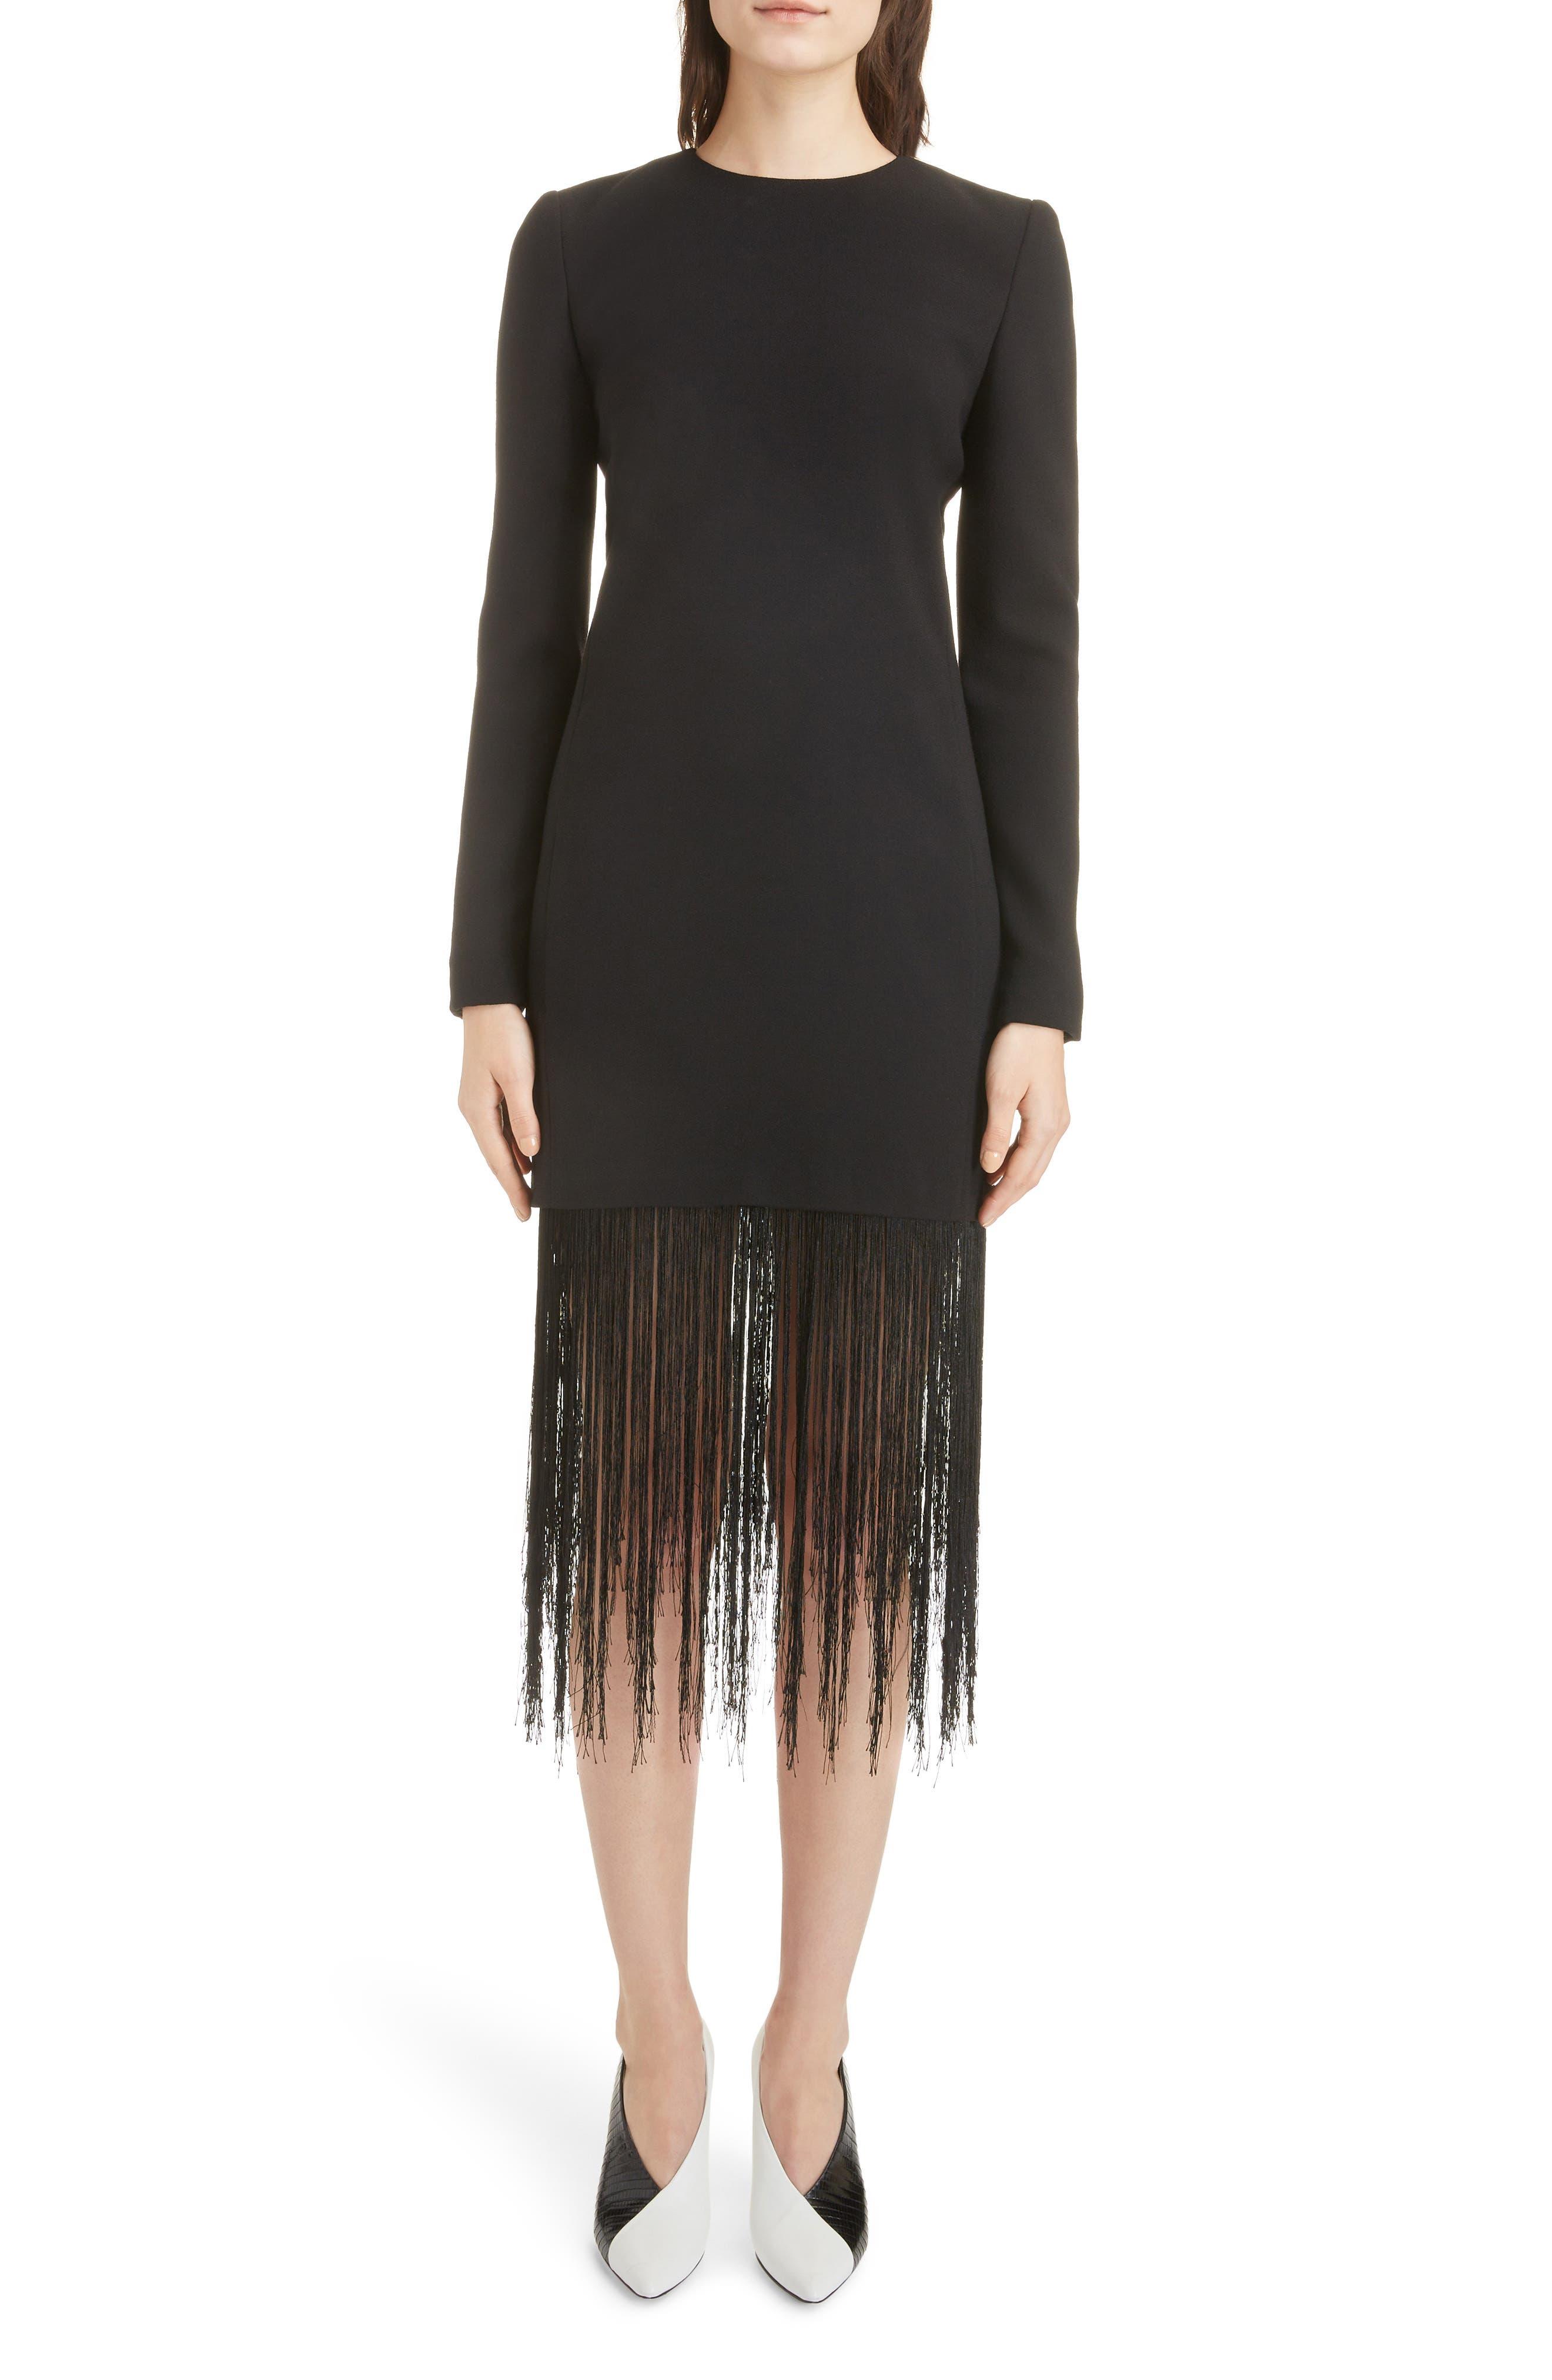 Givenchy Fringe Hem Wool Crepe Sheath Dress, 6 FR - Black